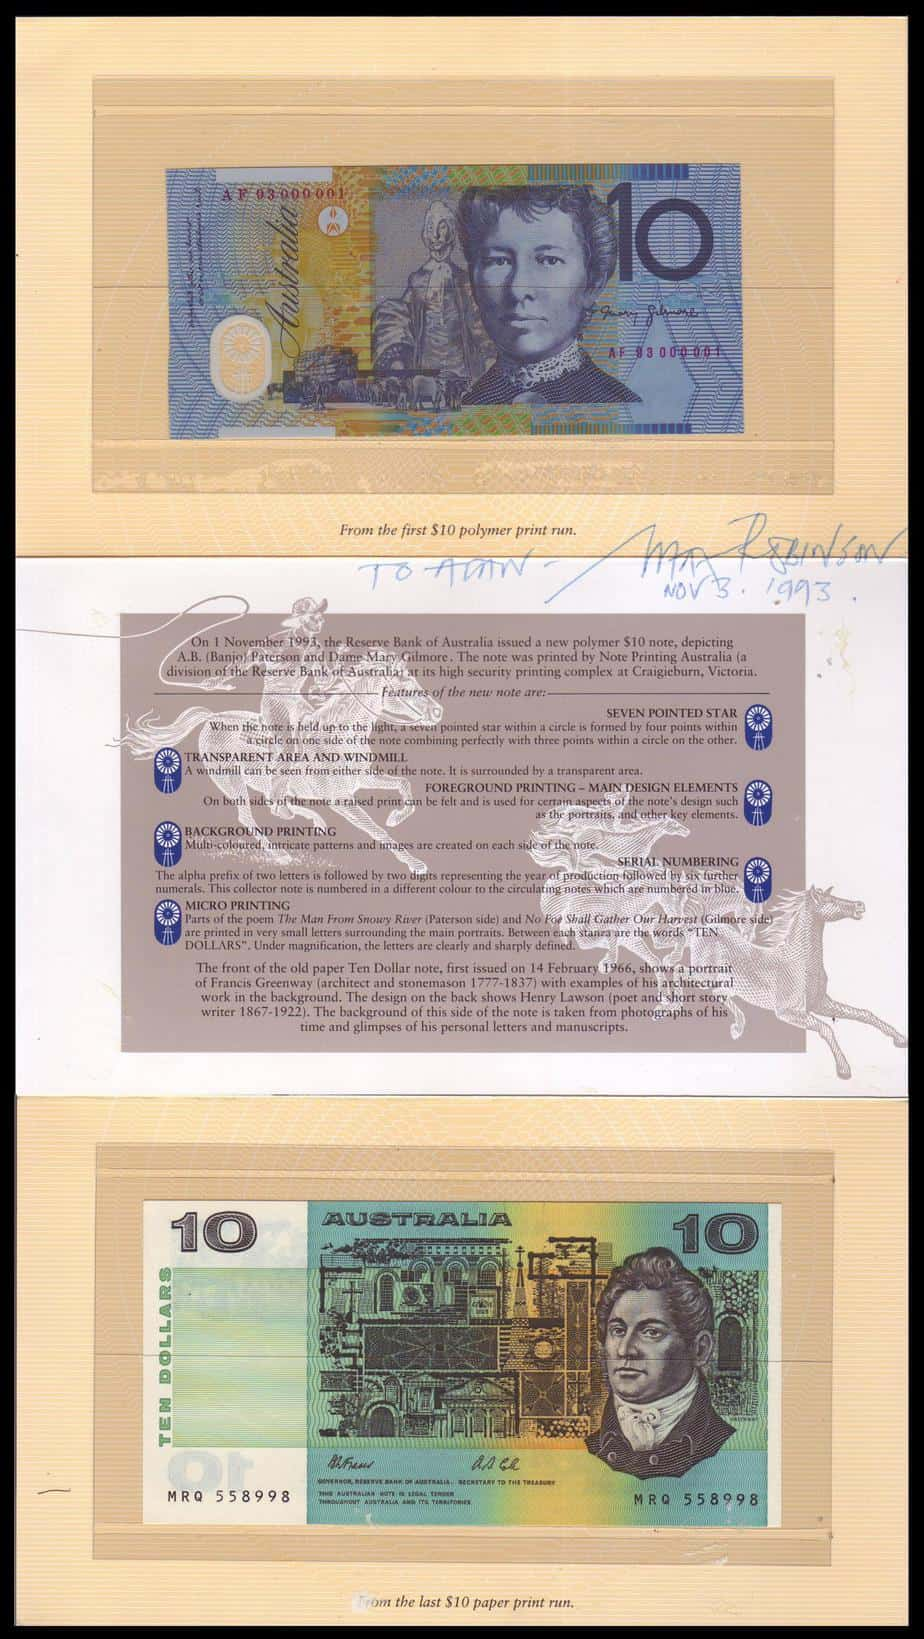 10 dolares Australianos